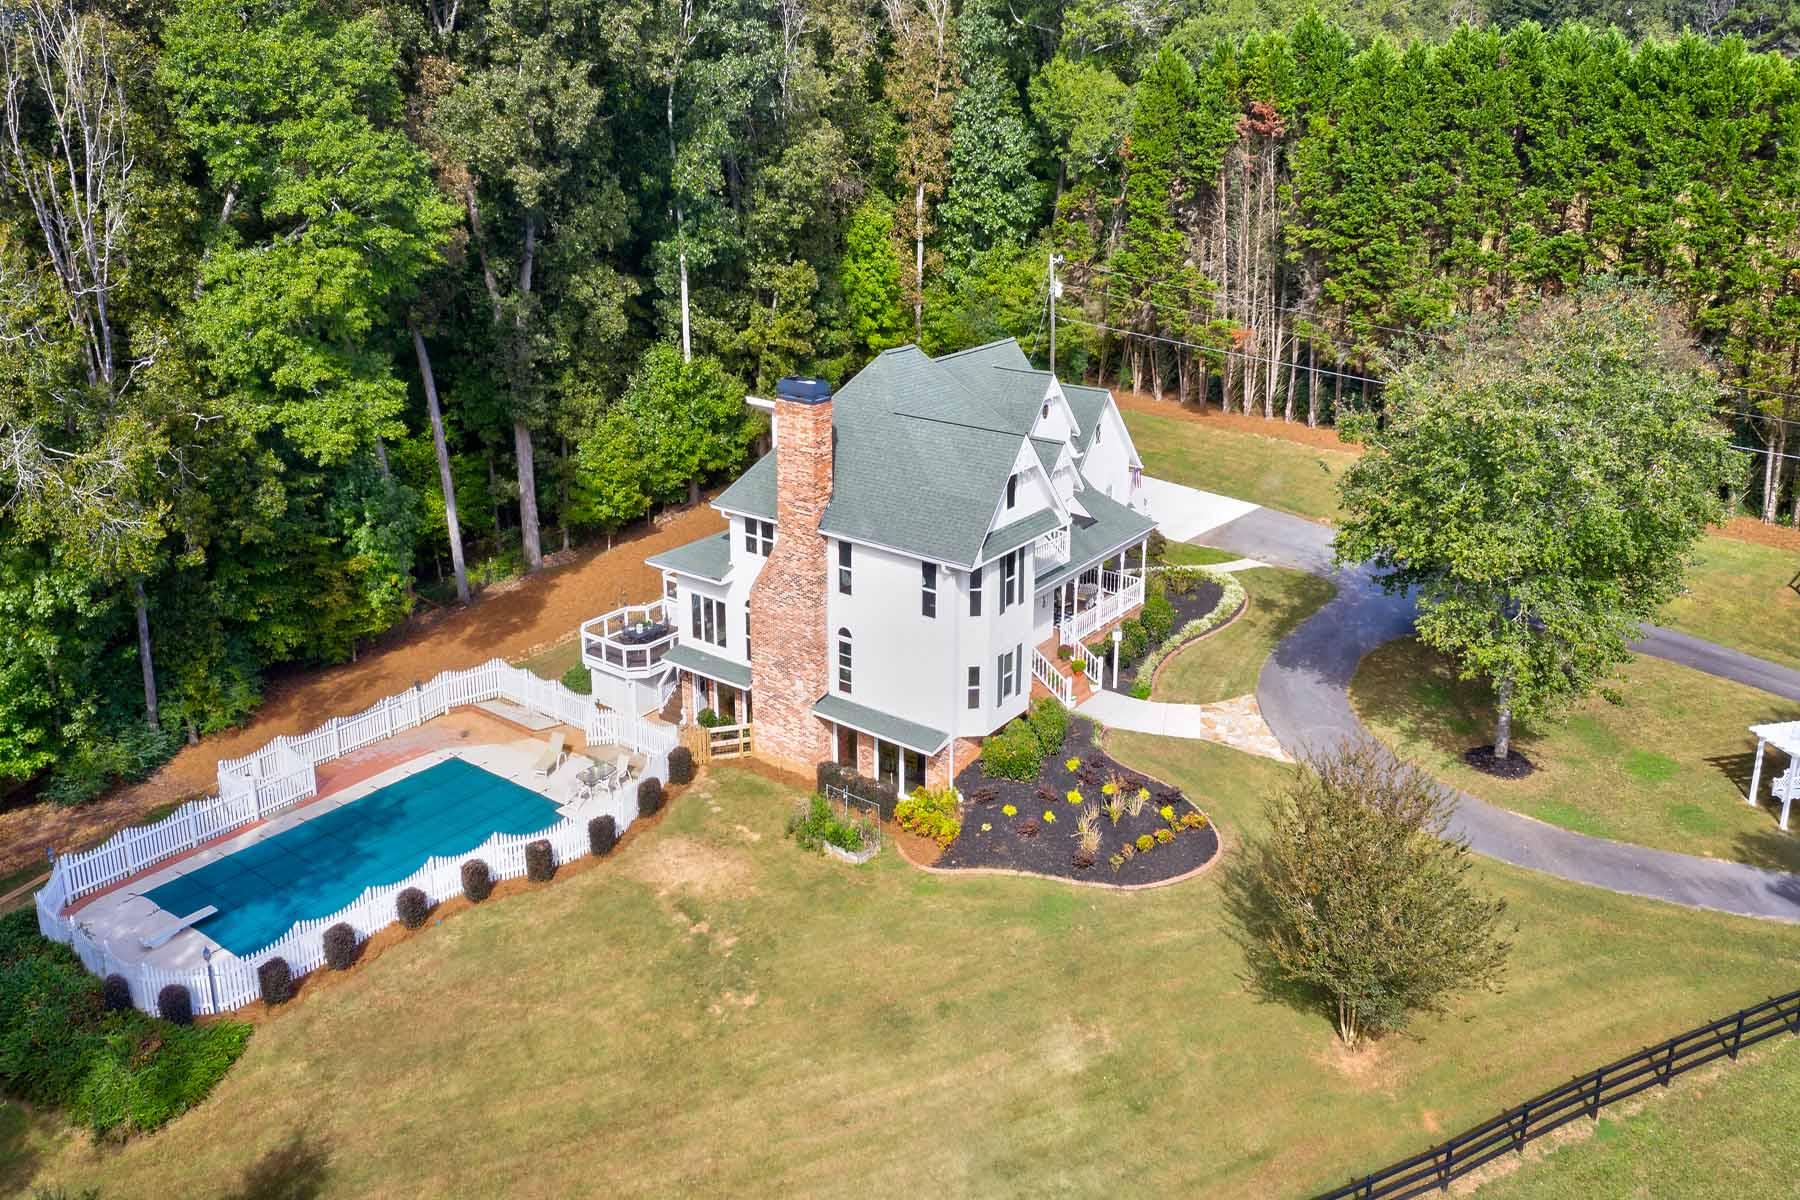 Single Family Home for Sale at Gated Milton Farm 14450 Birmingham Highway Milton, Georgia 30004 United States